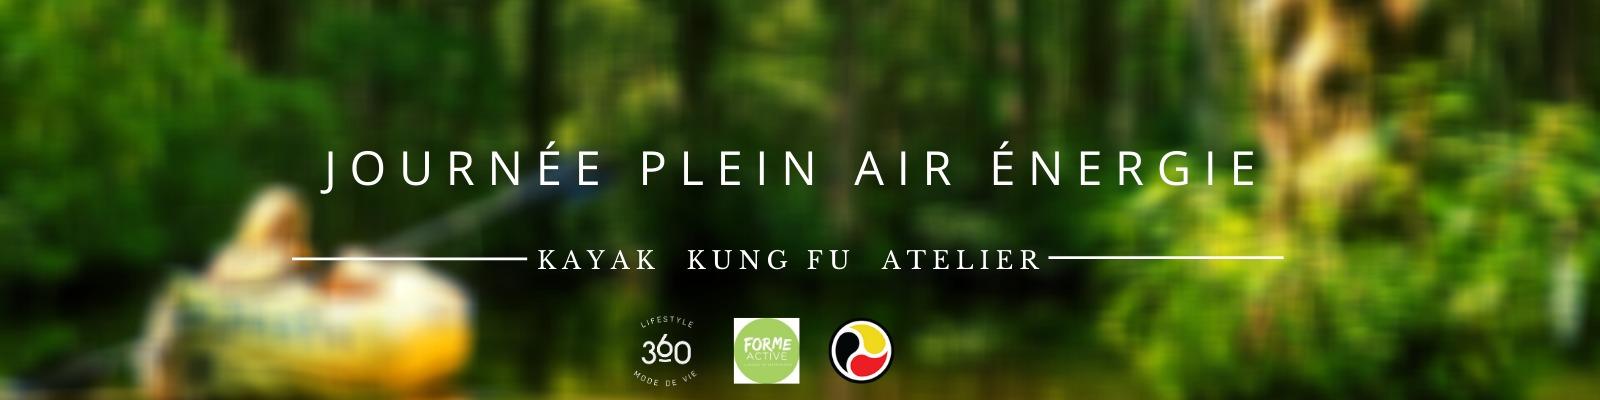 Journée plein air Énergie